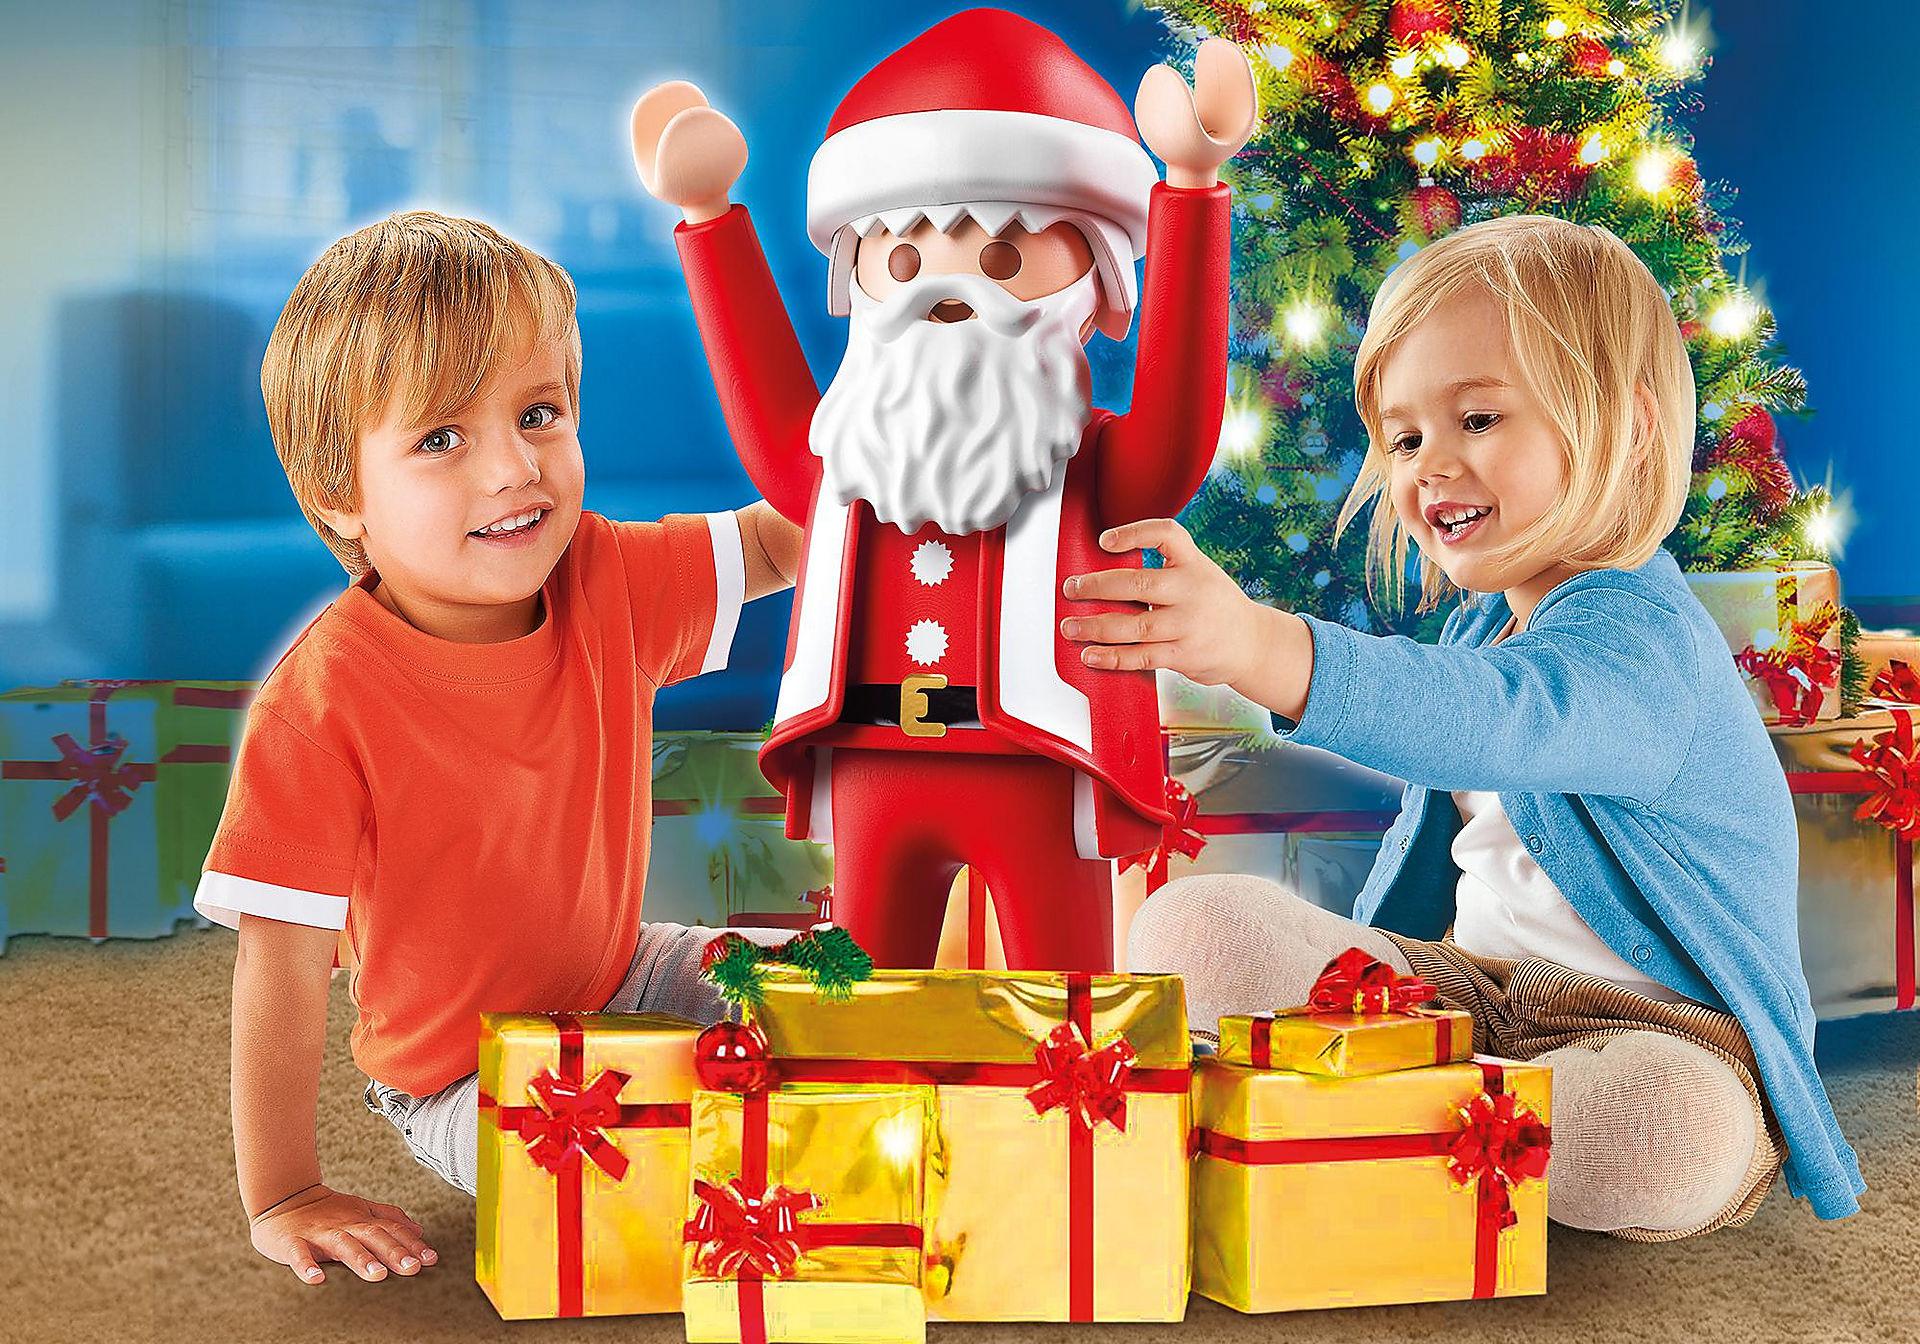 6629 PLAYMOBIL XXL Santa Claus zoom image1